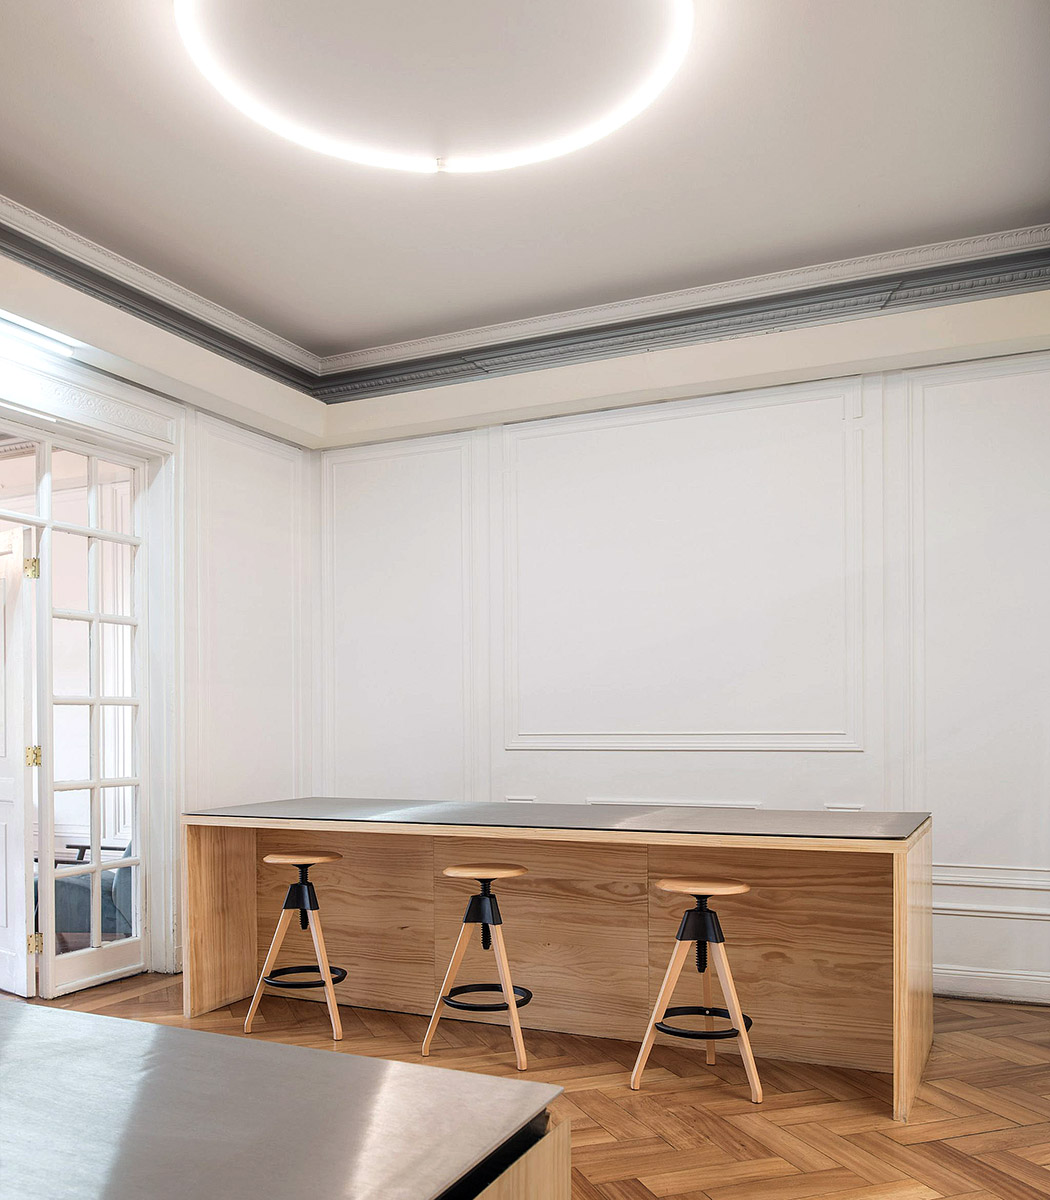 Fintual-Studio-Caceres-lazo-Bruno-Giliberto-05